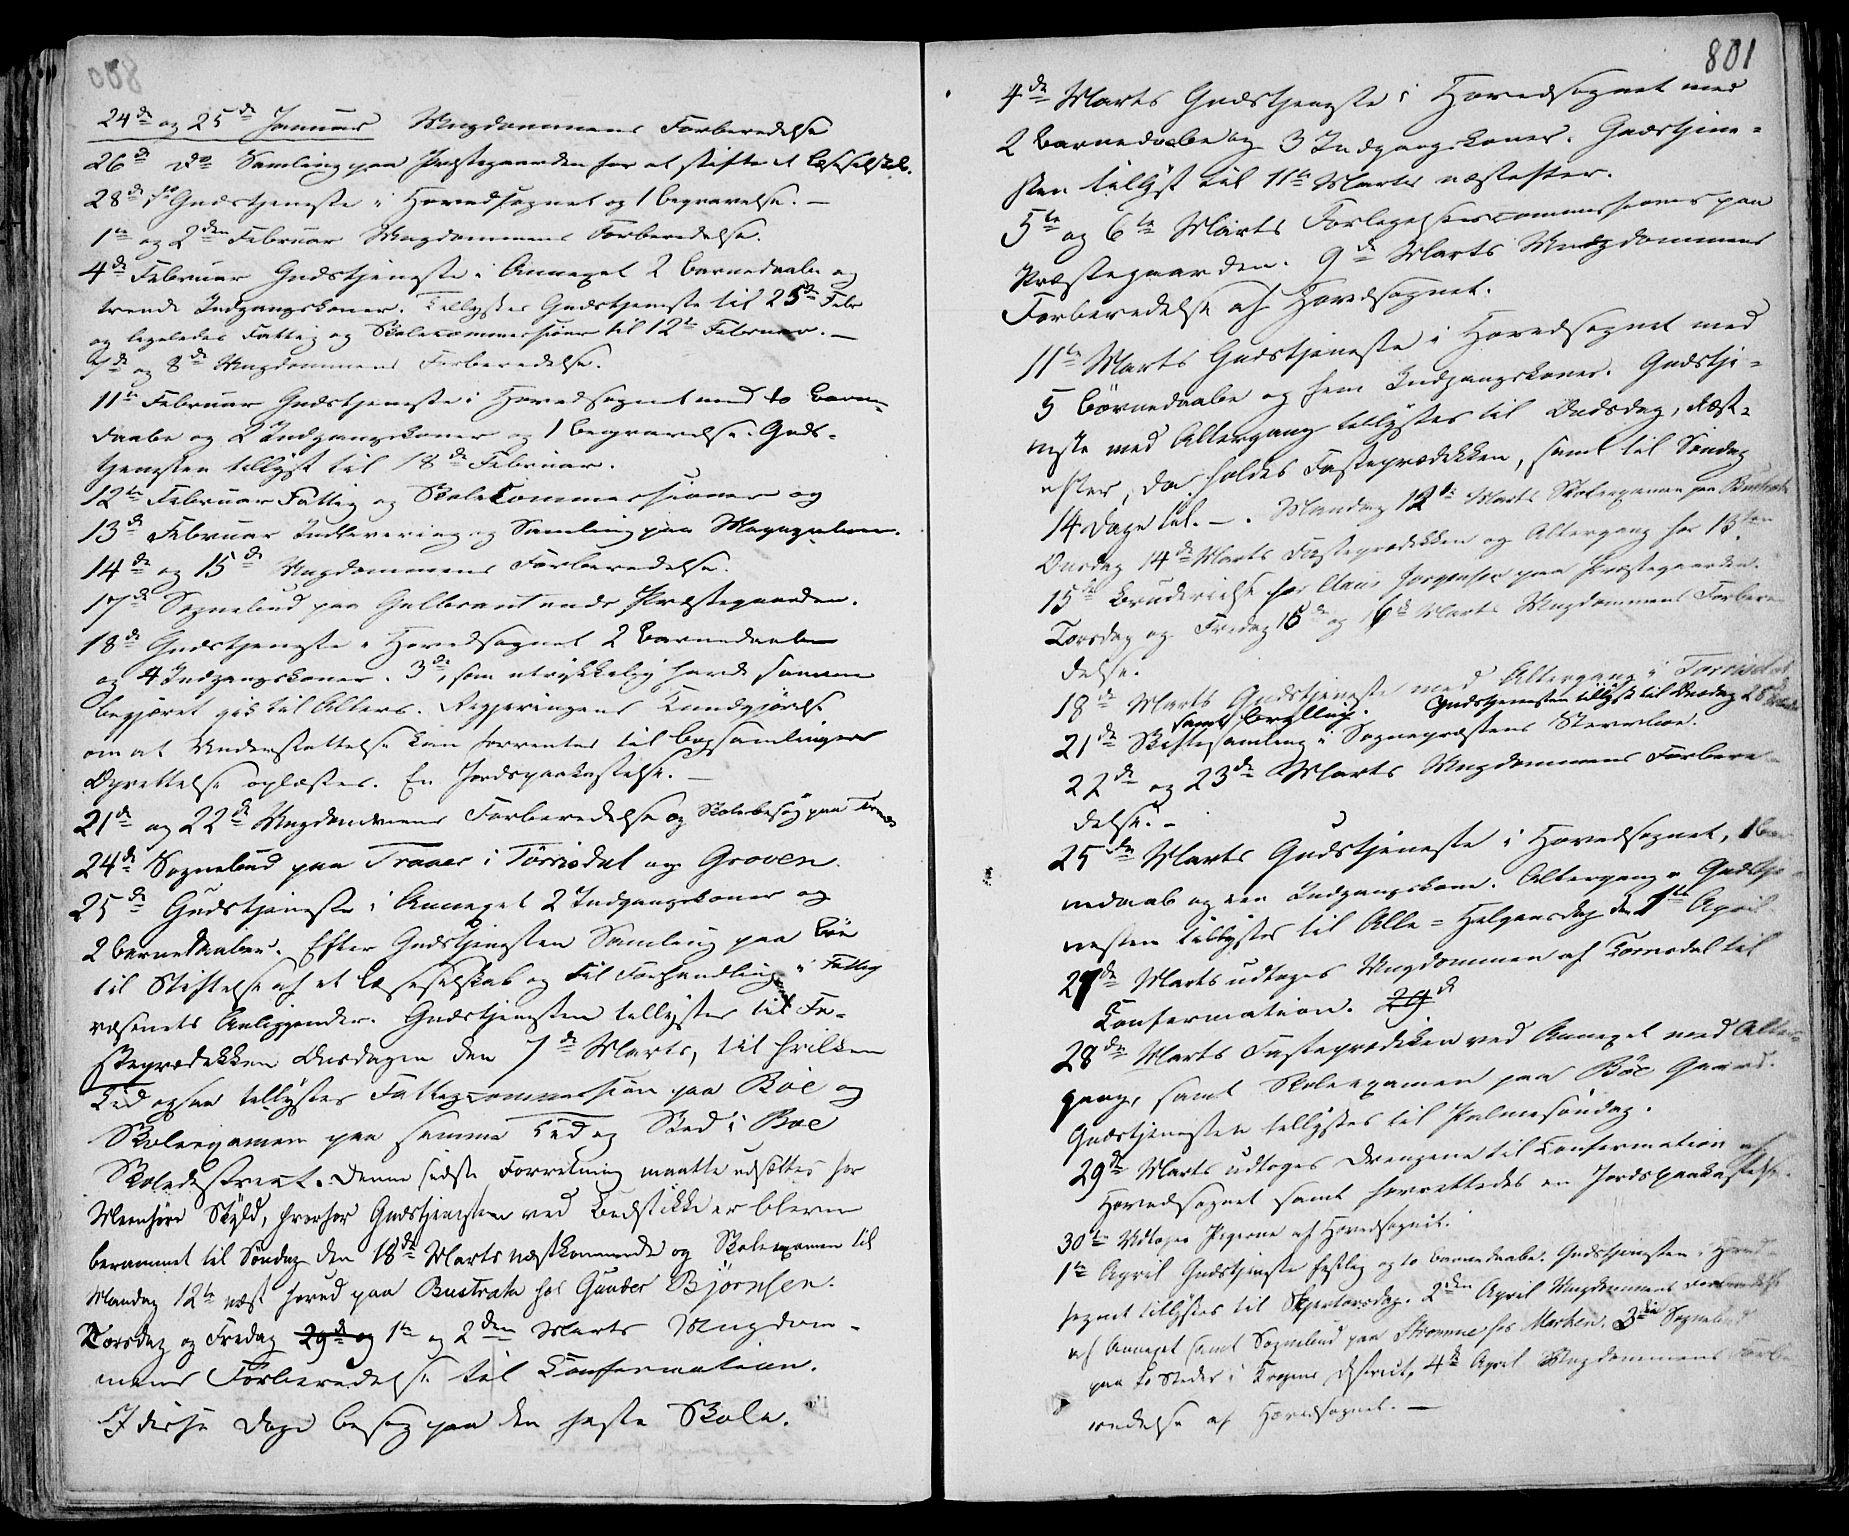 SAKO, Drangedal kirkebøker, F/Fa/L0007b: Ministerialbok nr. 7b, 1837-1856, s. 801